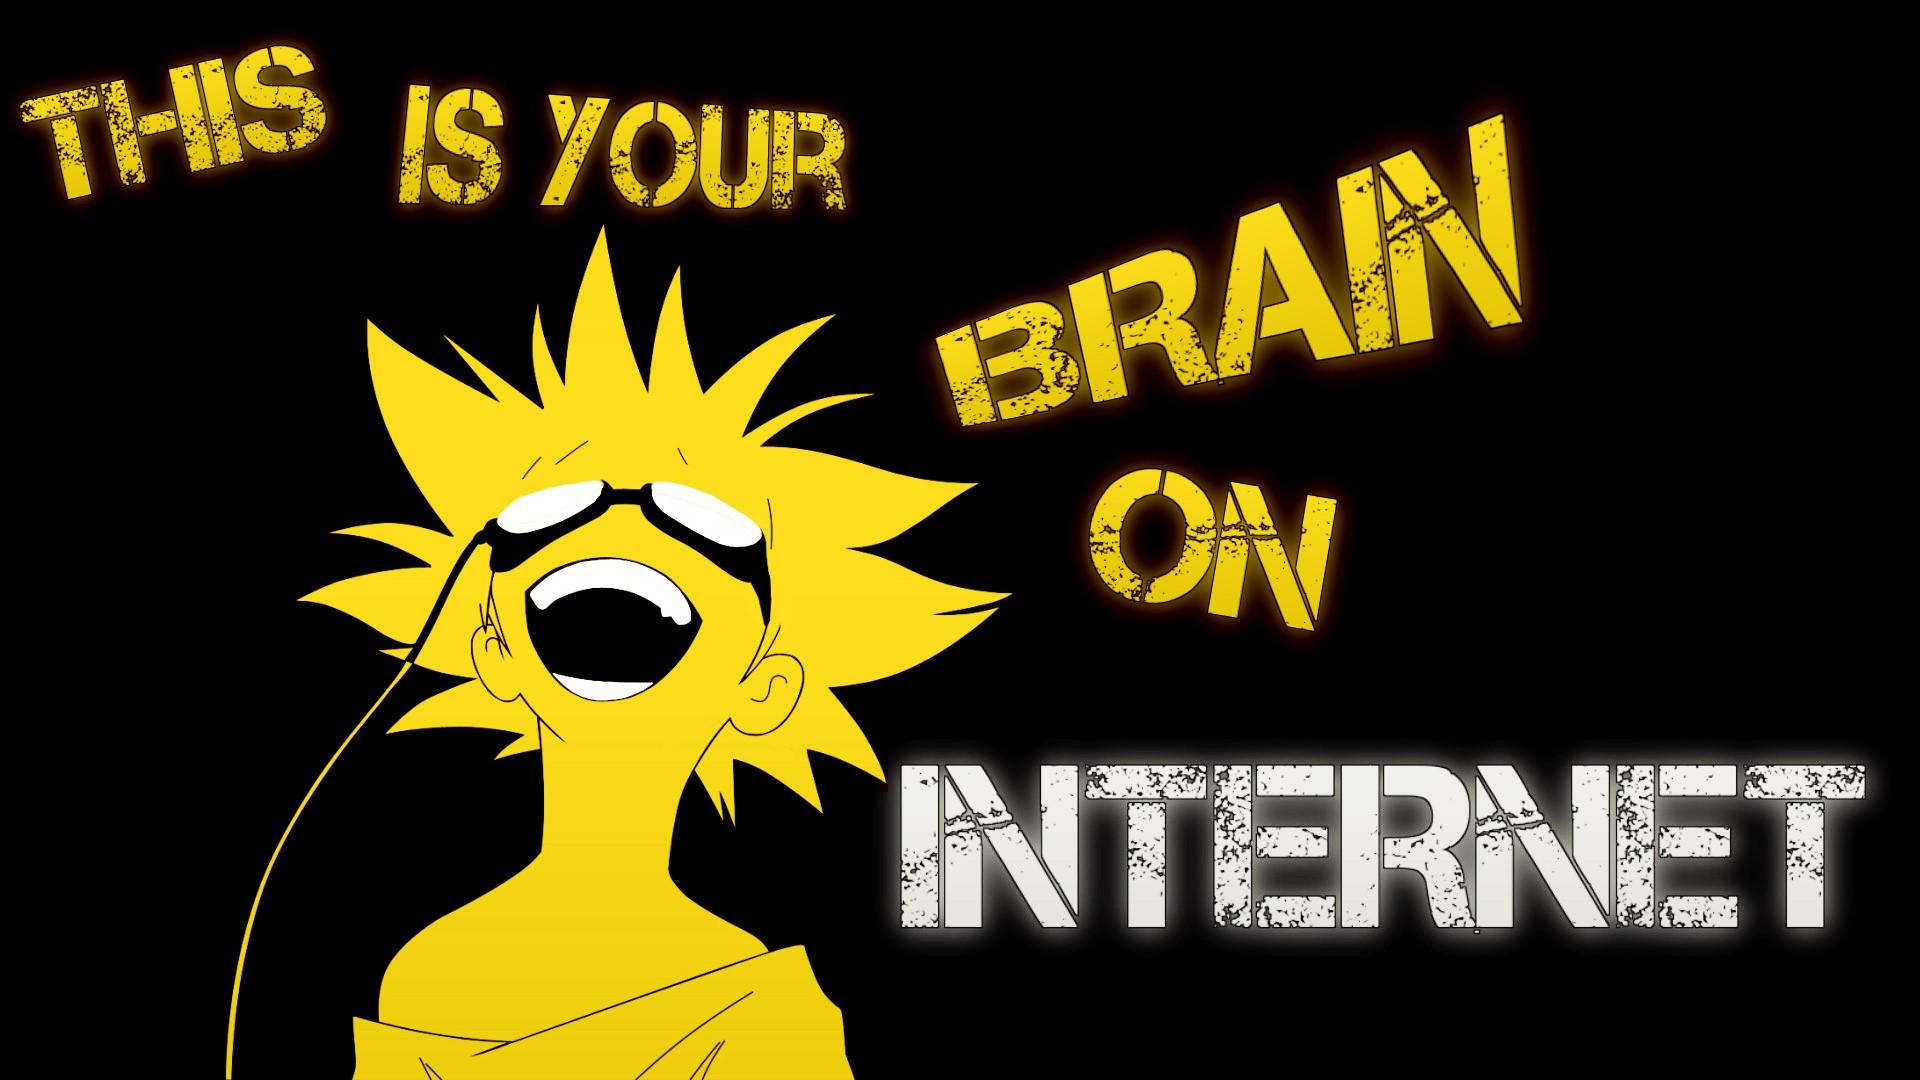 Anime 1920x1080 Cowboy Bebop anime open mouth humor yellow internet